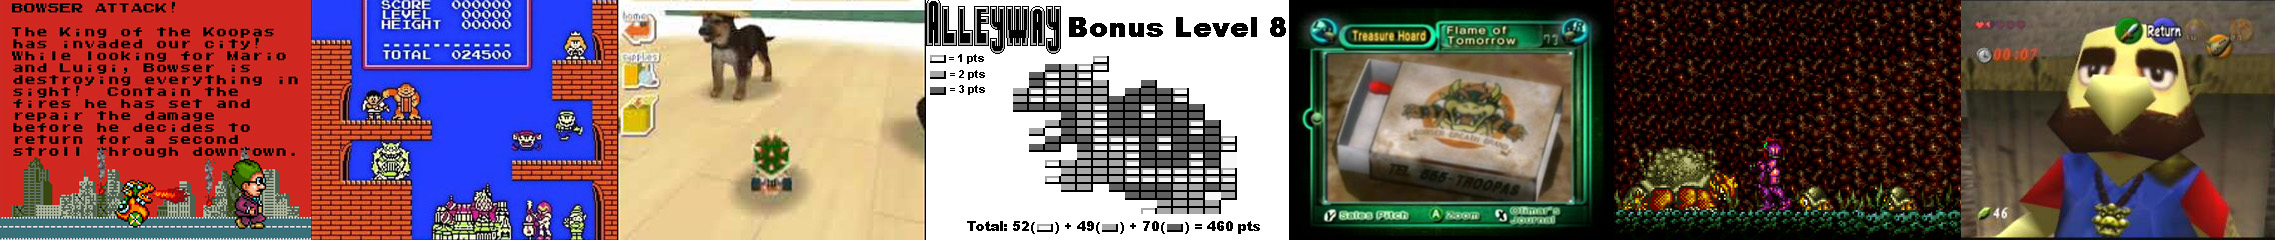 Sim City (SNES), Tetris (NES), Nintendogs (DS), Alleyway (GB), Pikmin 2 (NGC) Super Metroid (SNES) et The Legend of Zelda : OoT (N64)